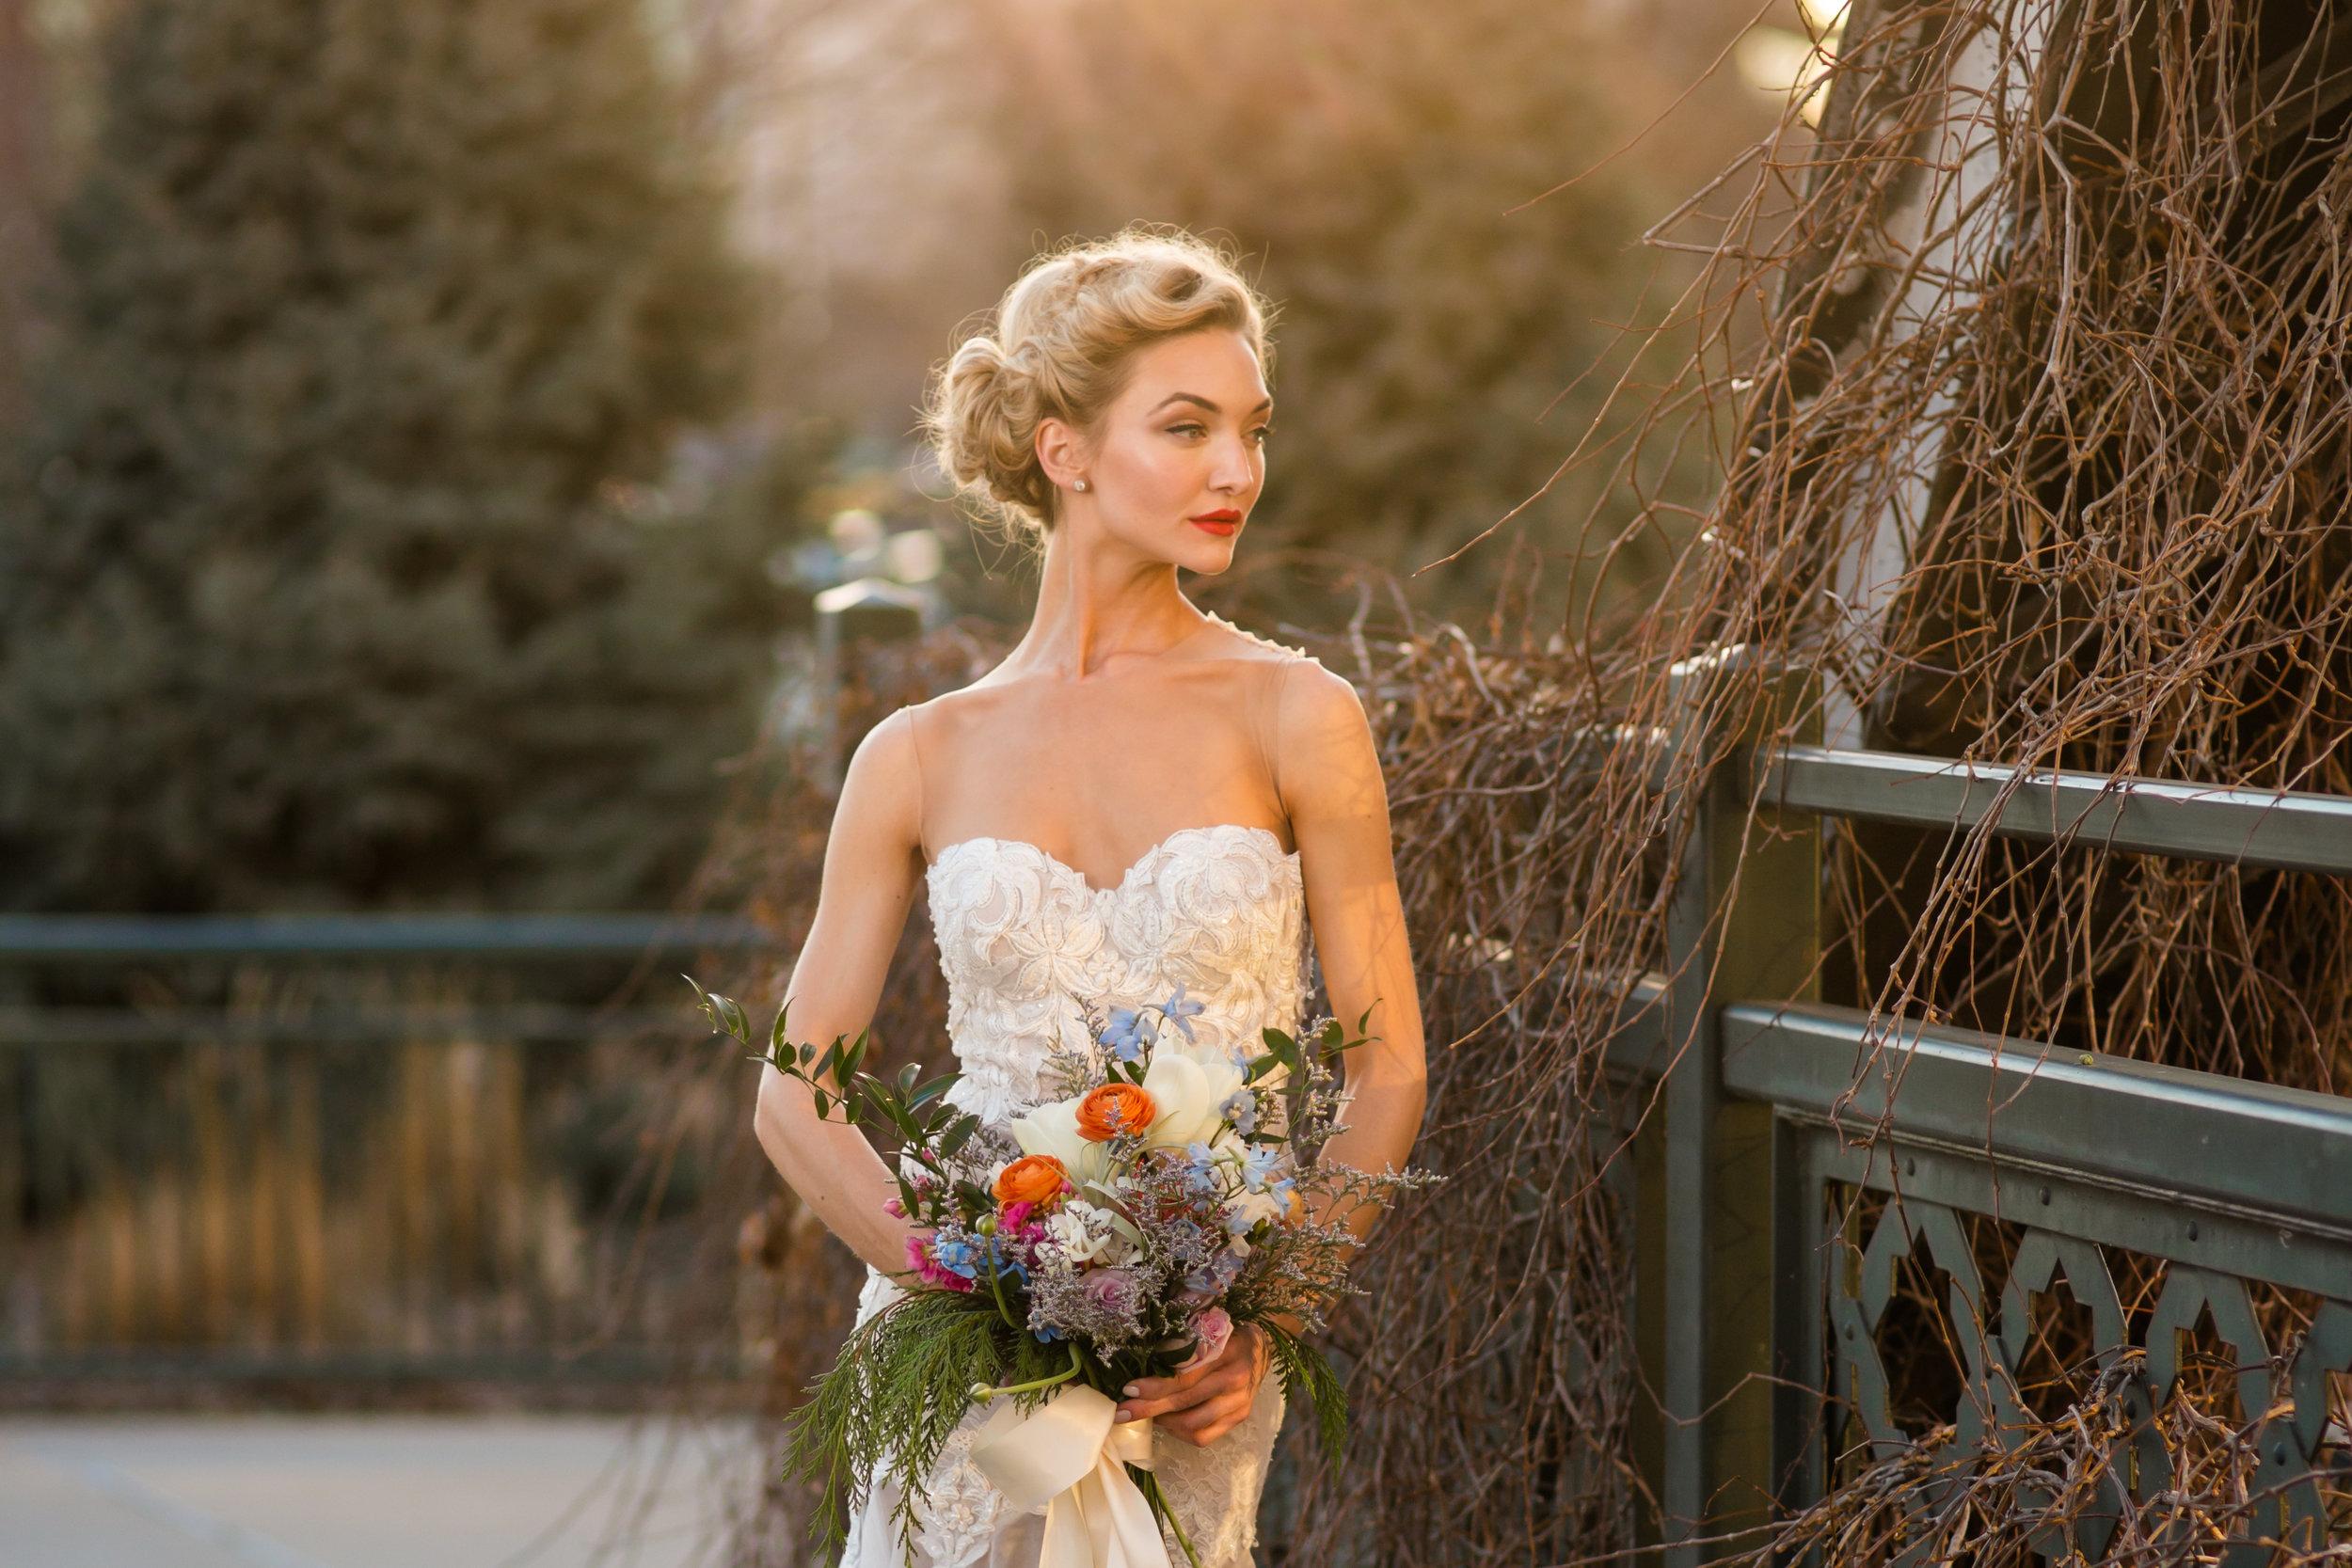 20160226-Moss-Denver-Aldabella-Photography-Milk-Glass-Production-0050.jpg